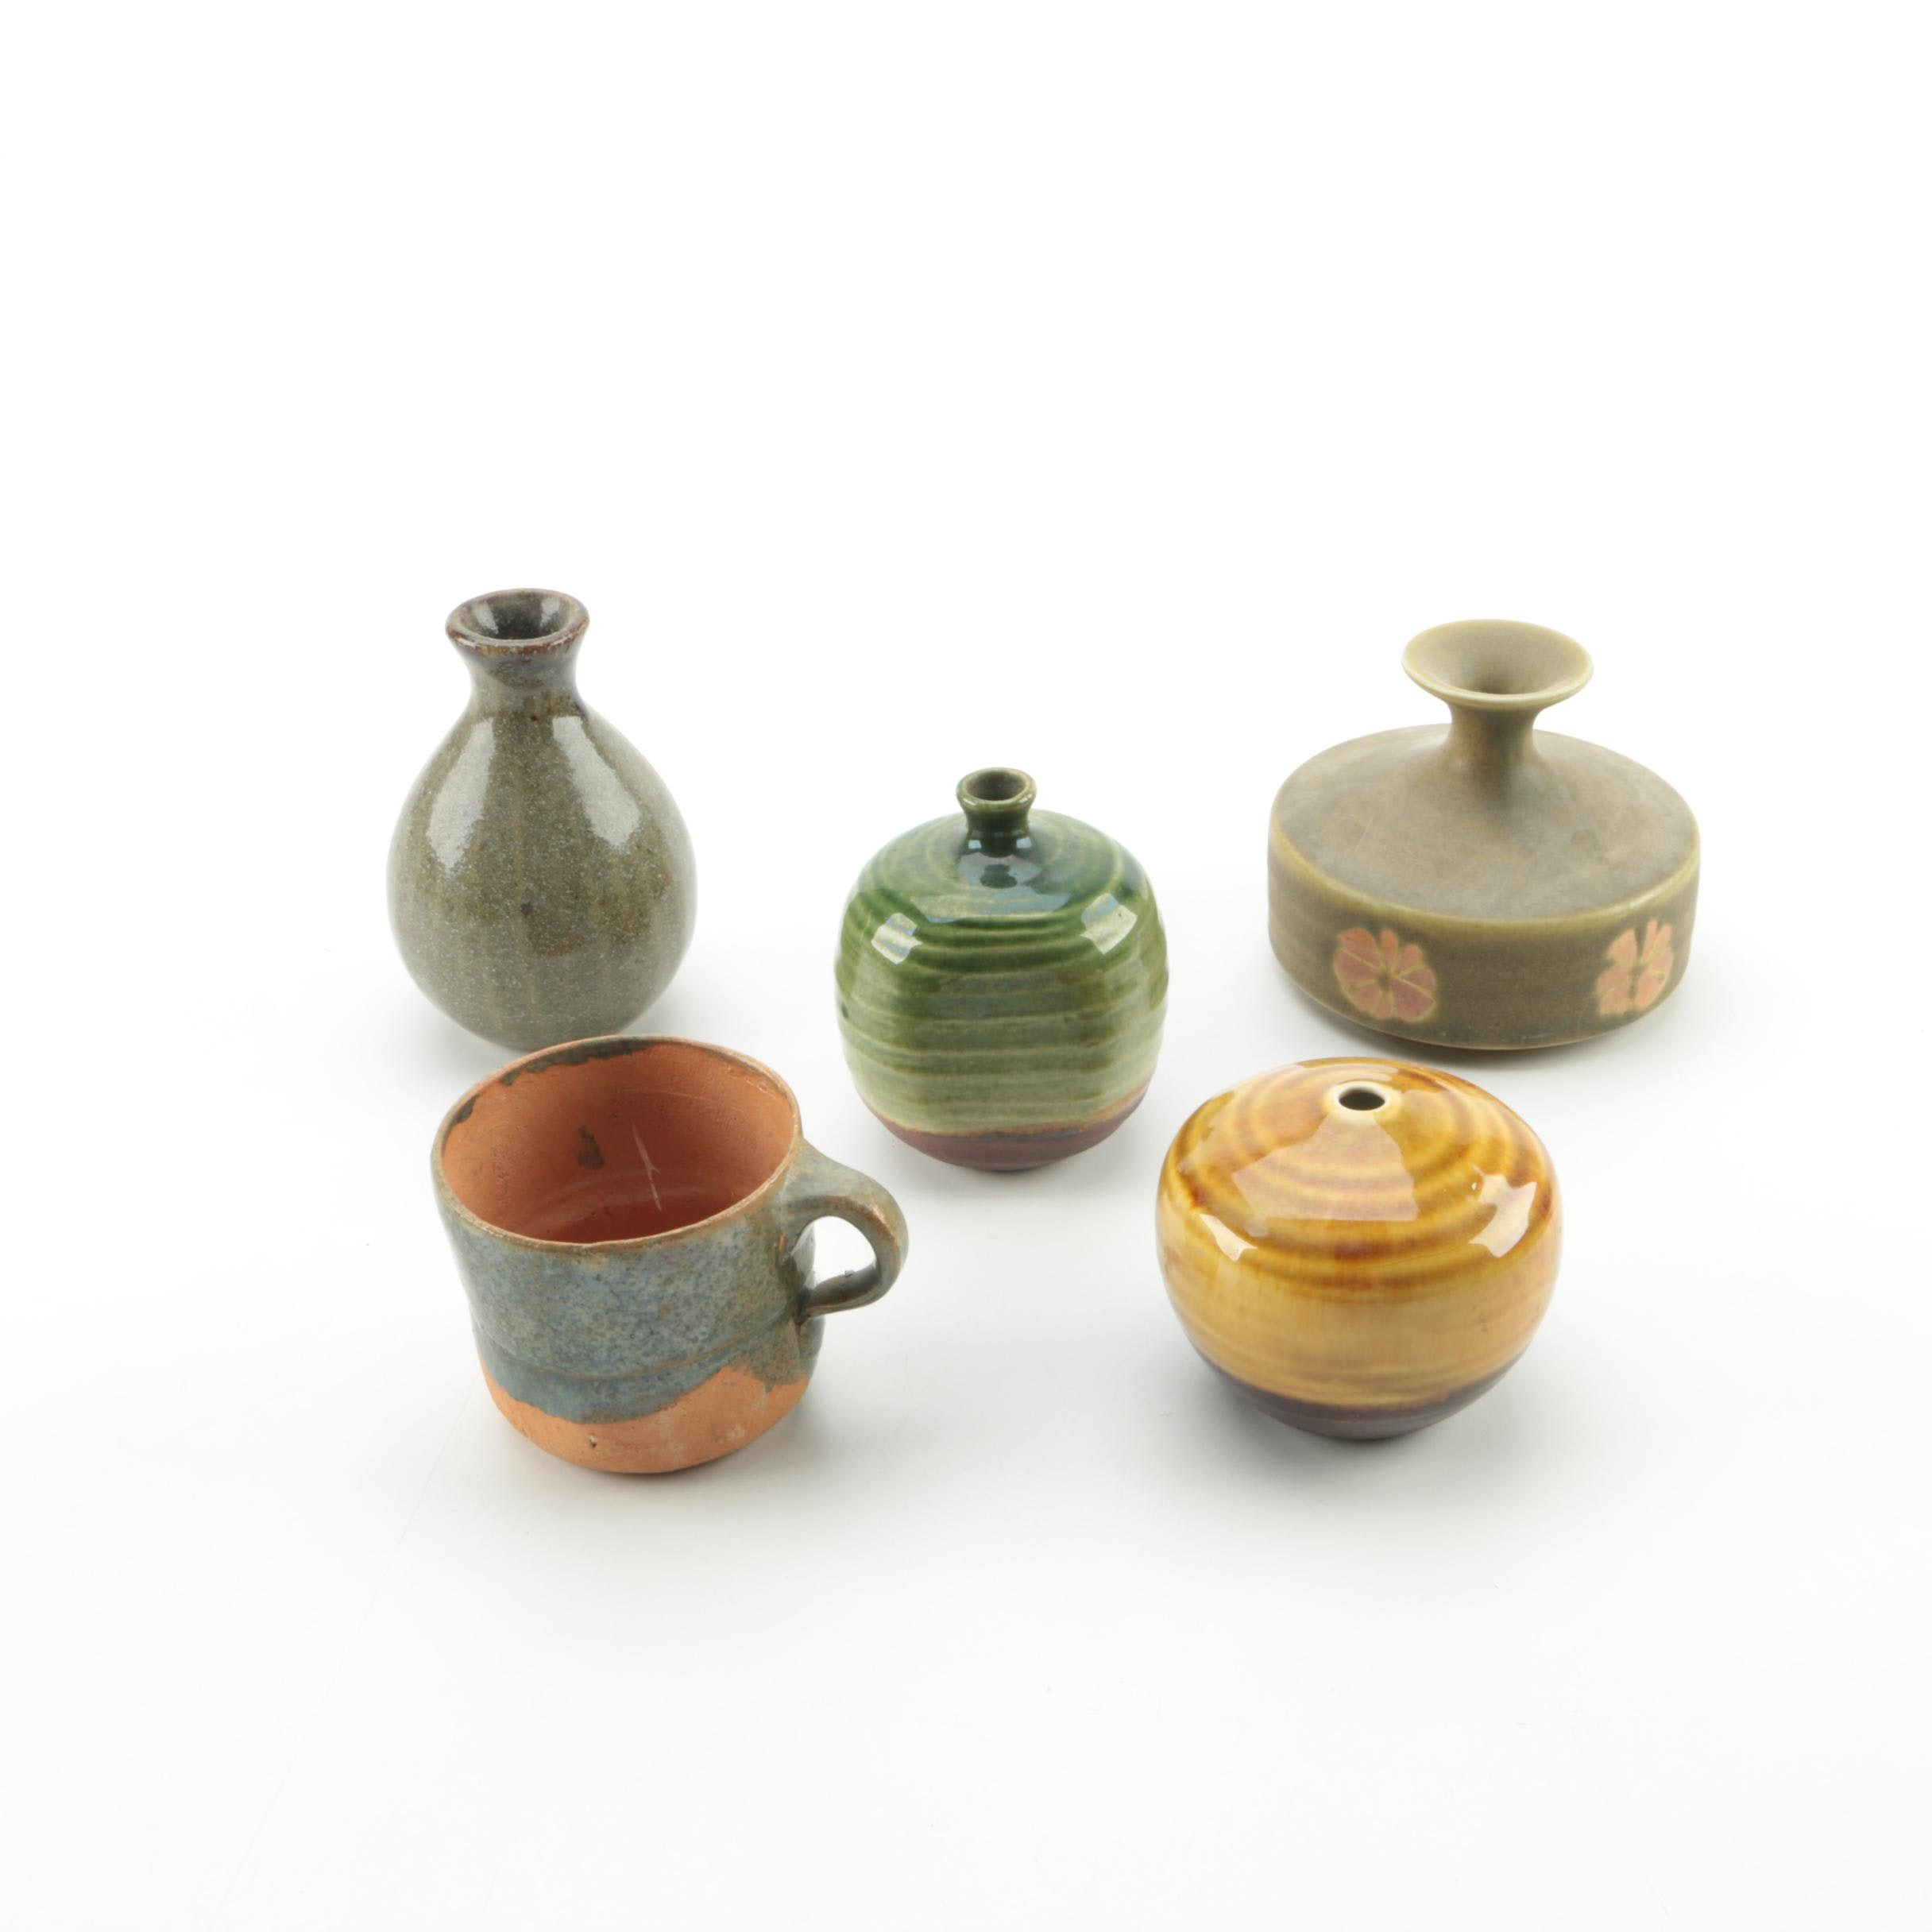 Earthenware and Ceramic Vases and Mug including Takahasi